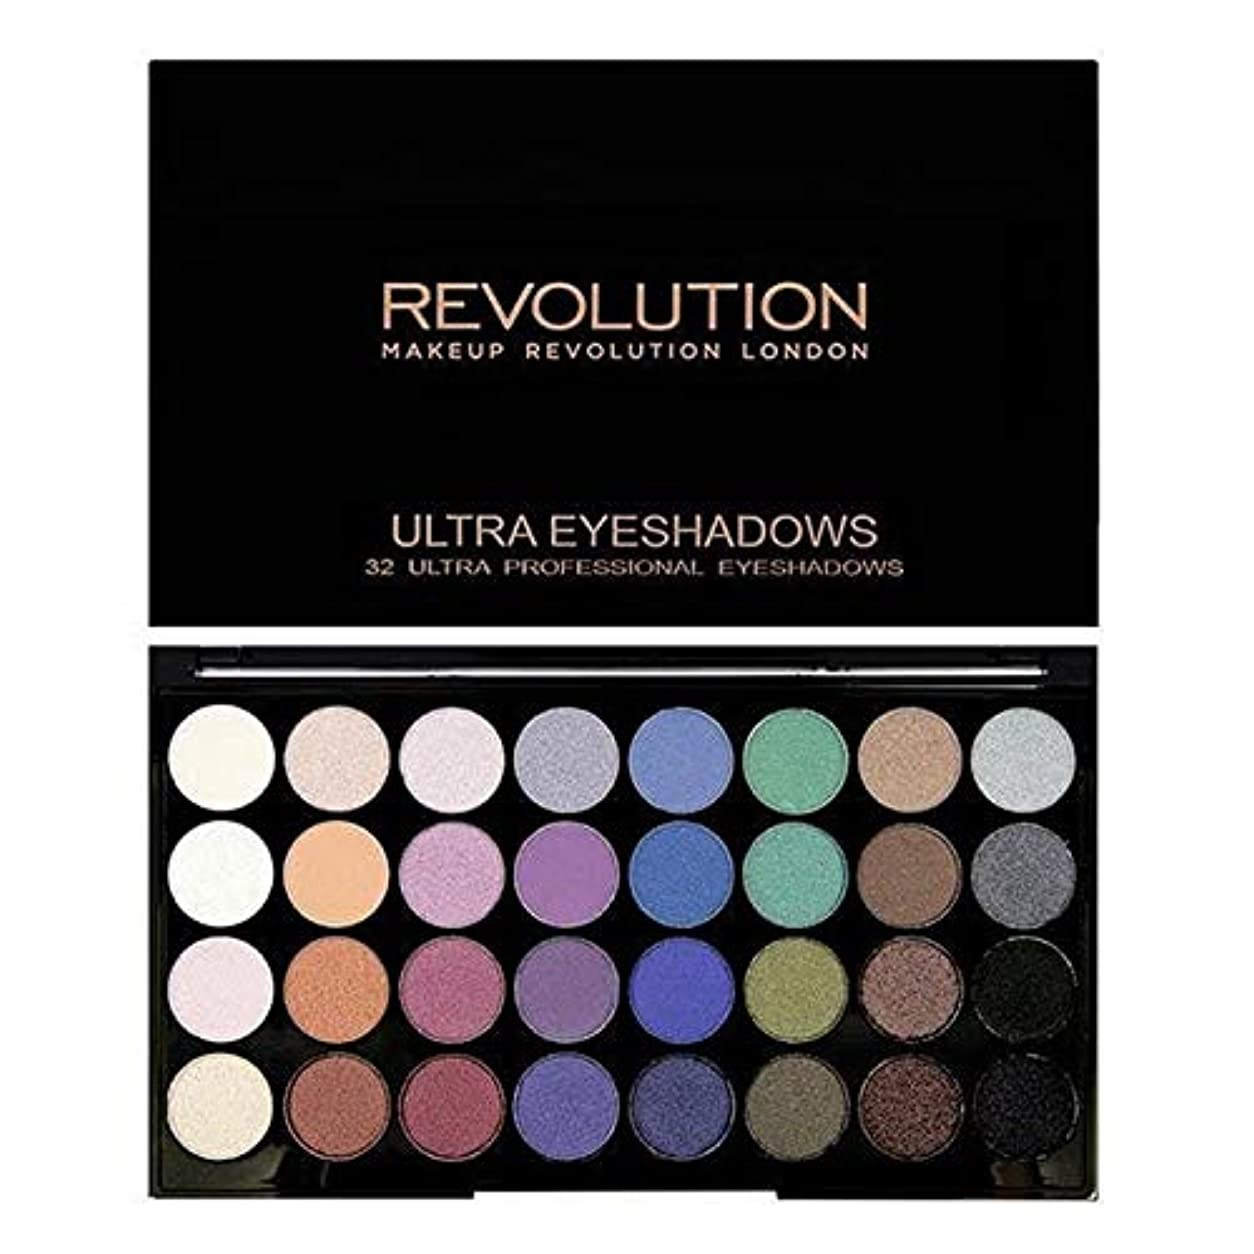 [Revolution ] 永遠に革命32アイシャドウパレット人魚 - Revolution 32 Eye Shadow Palette Mermaids Forever [並行輸入品]